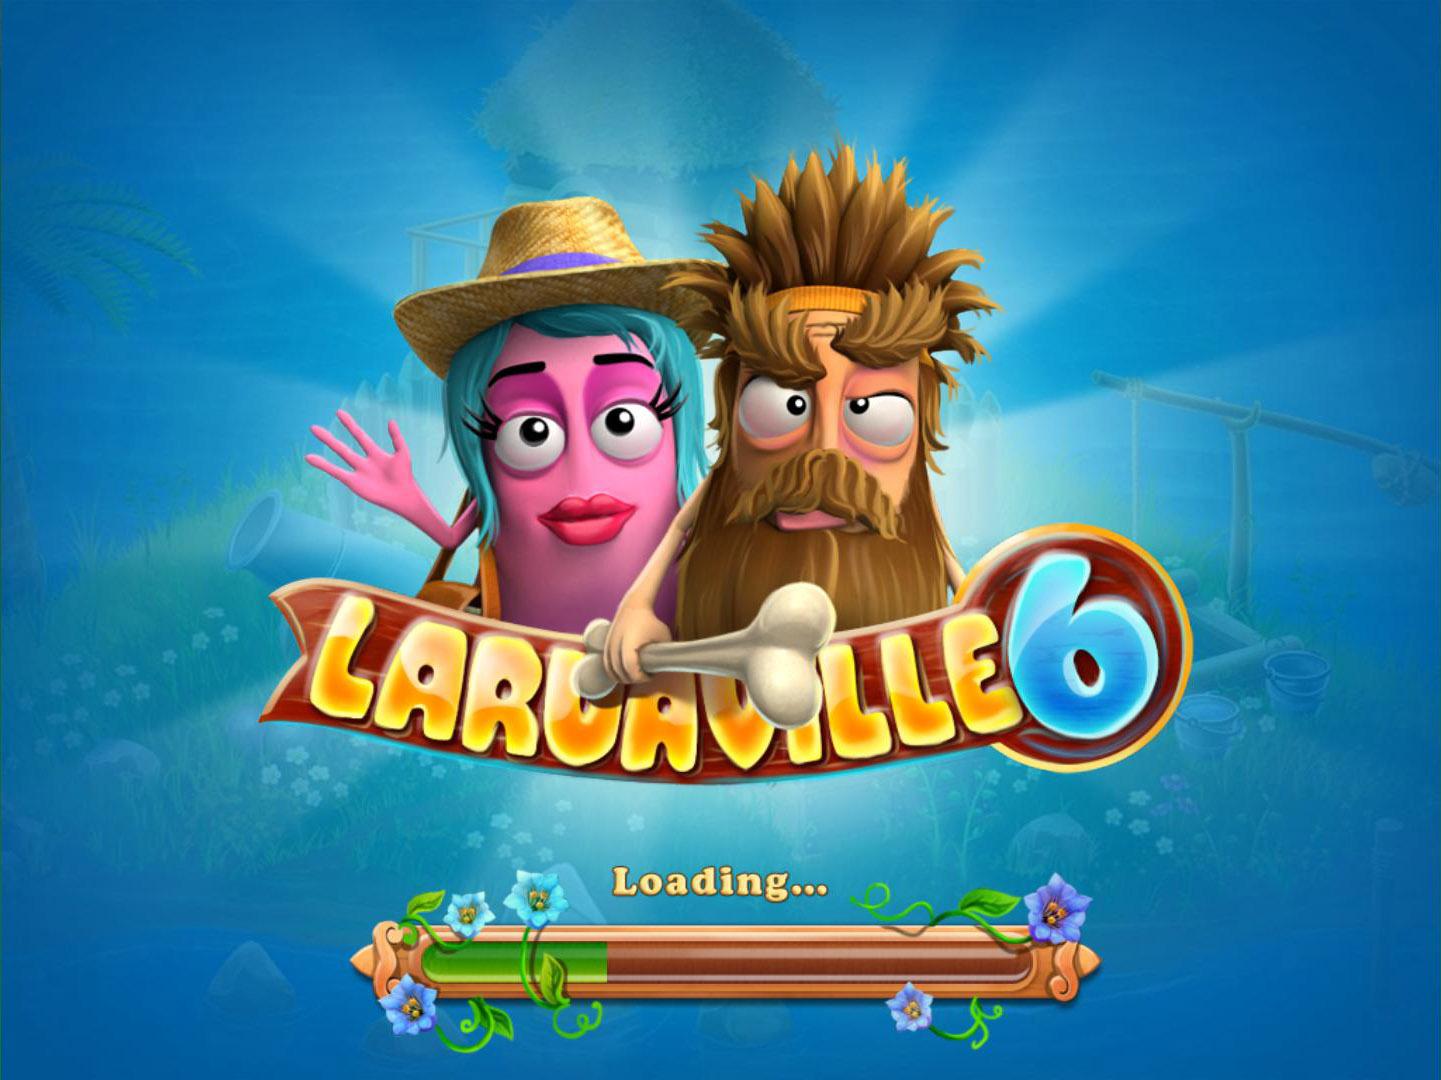 Ларуавиль 6 | Laruaville 6 (En)